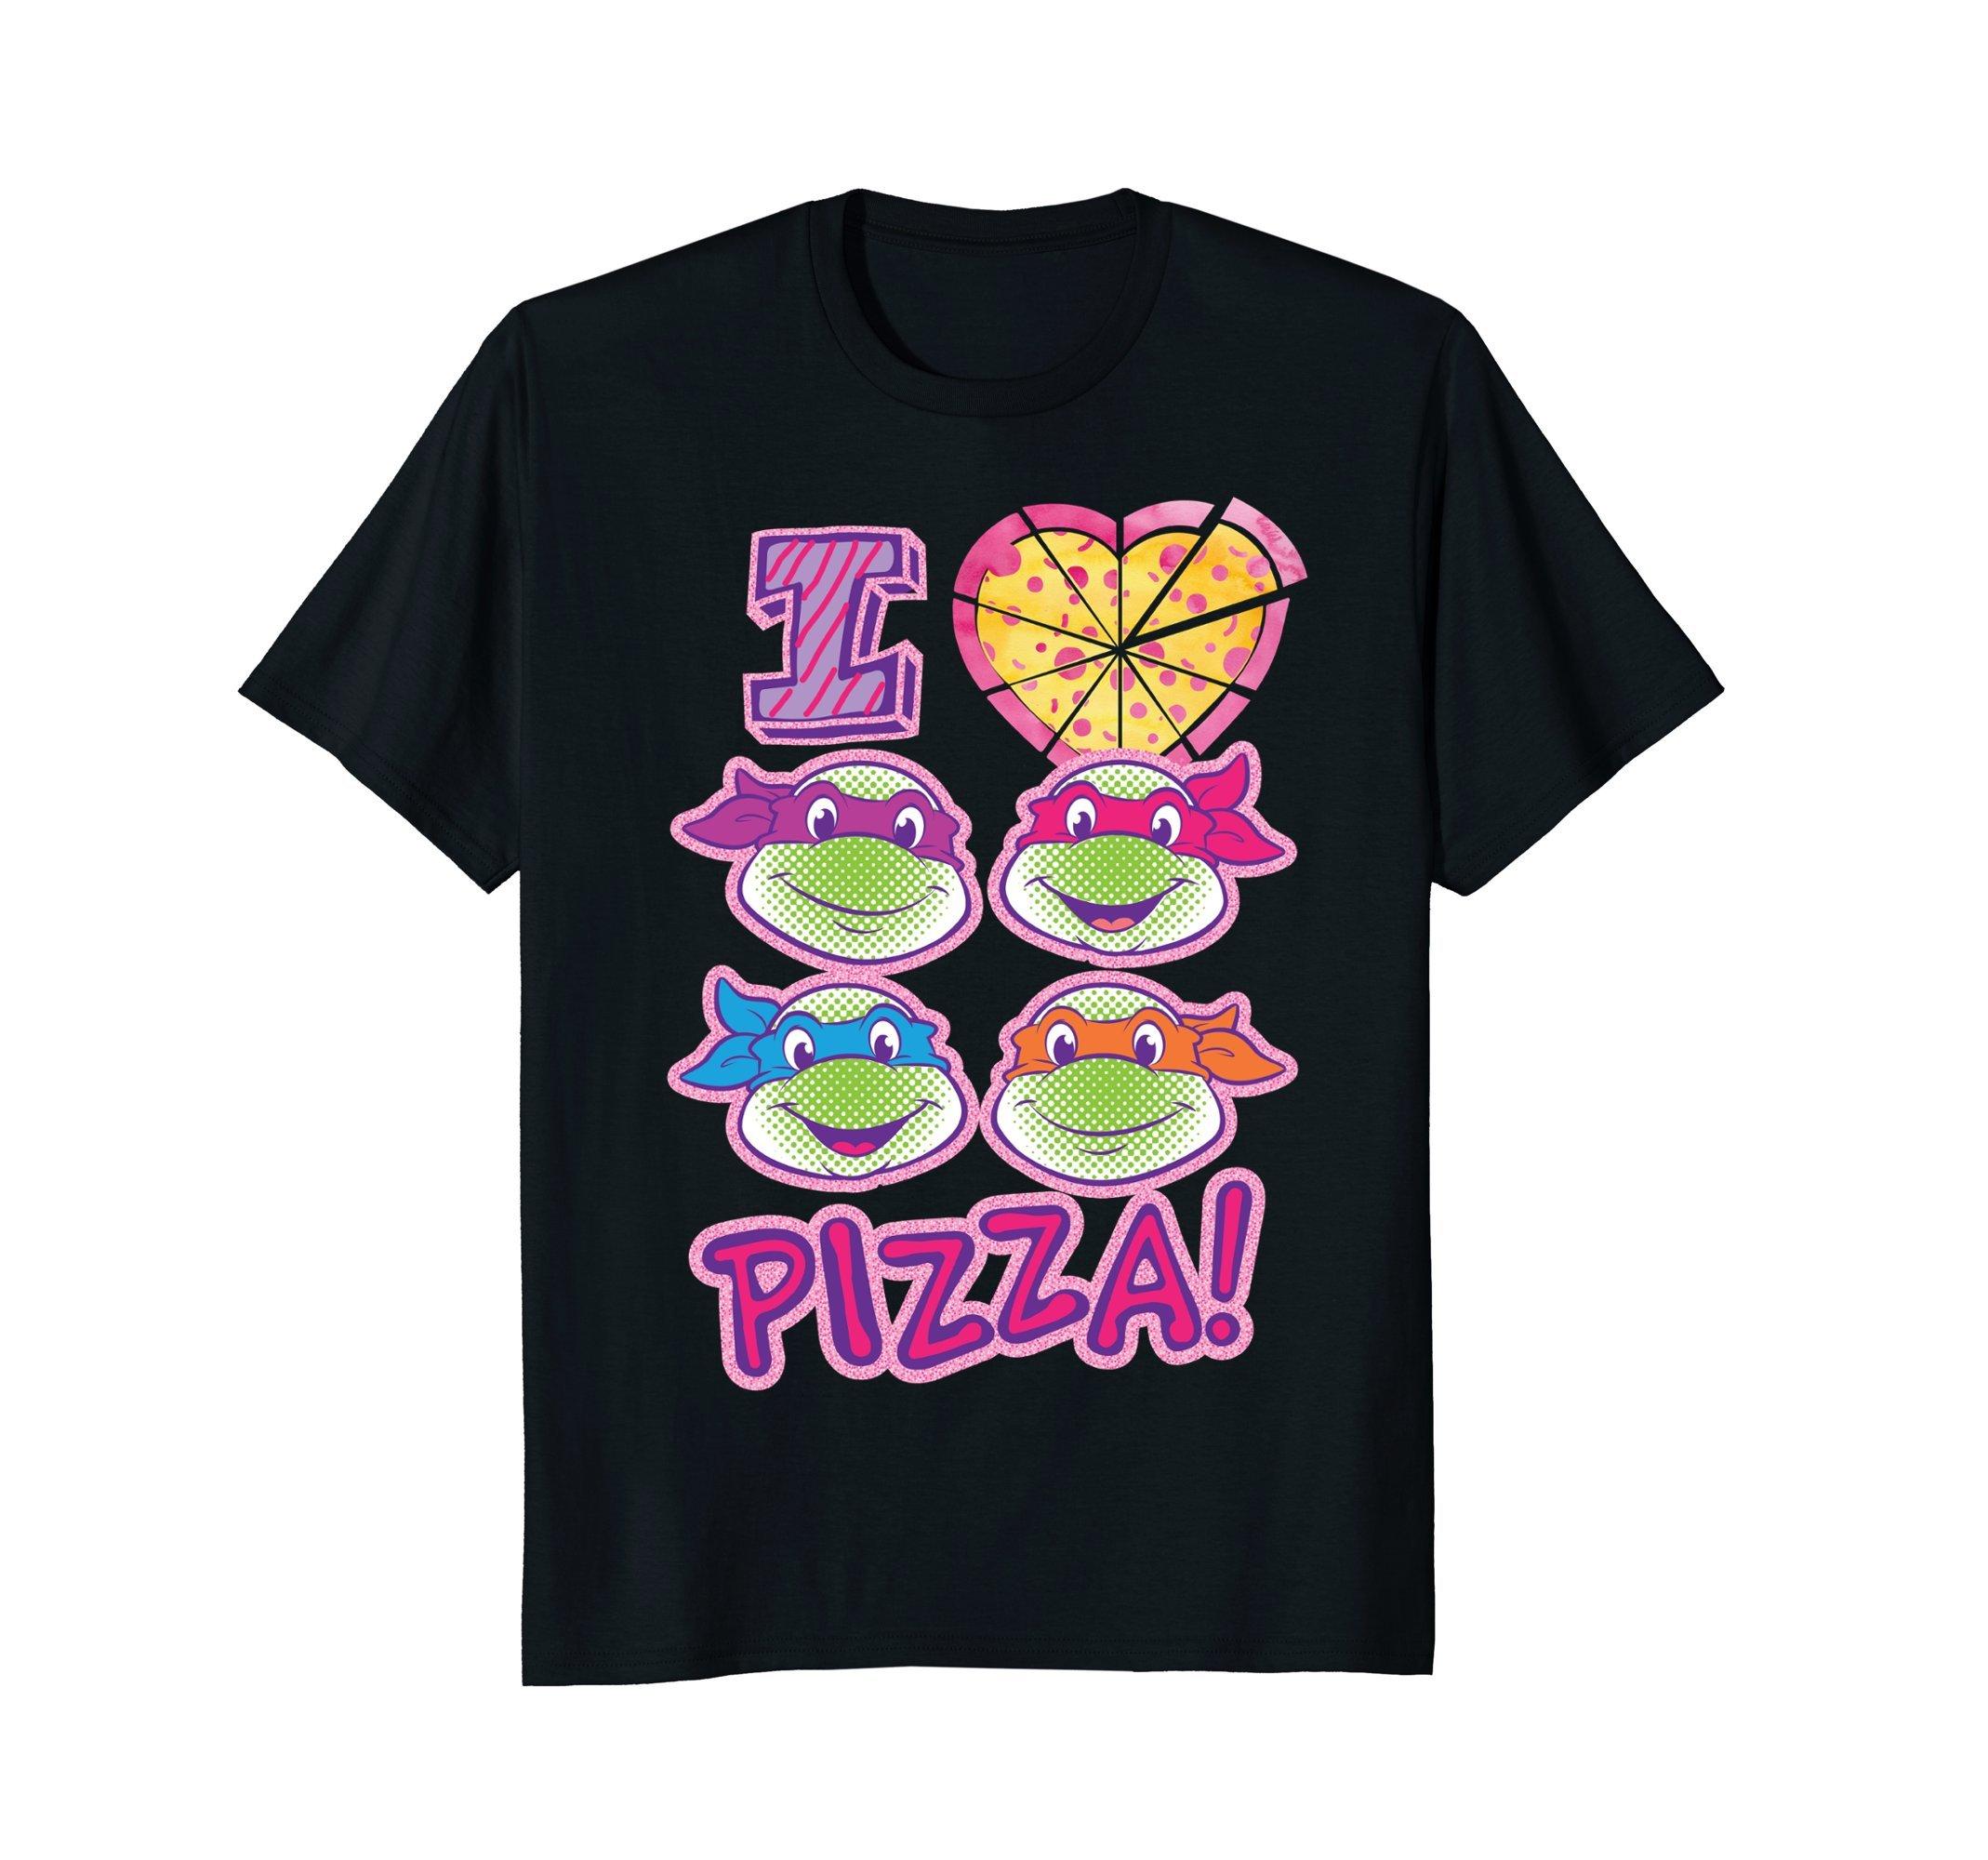 Teenage Mutant Ninja Turtles I Love Pizza T-Shirt